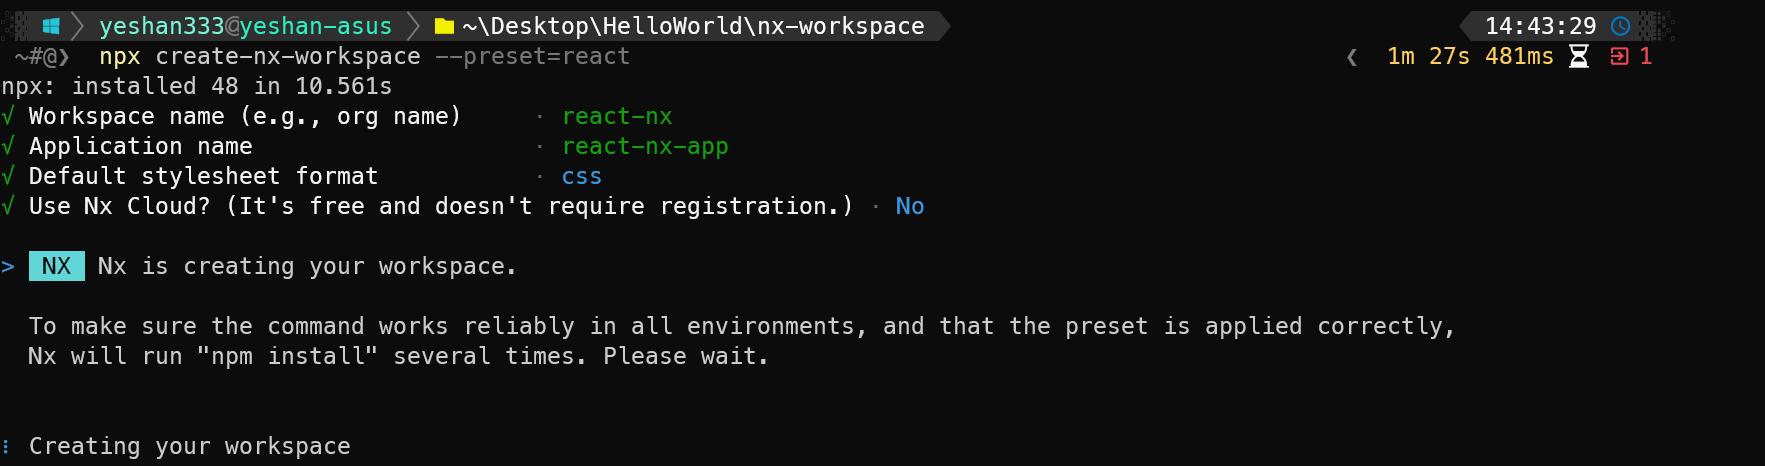 Nx create project